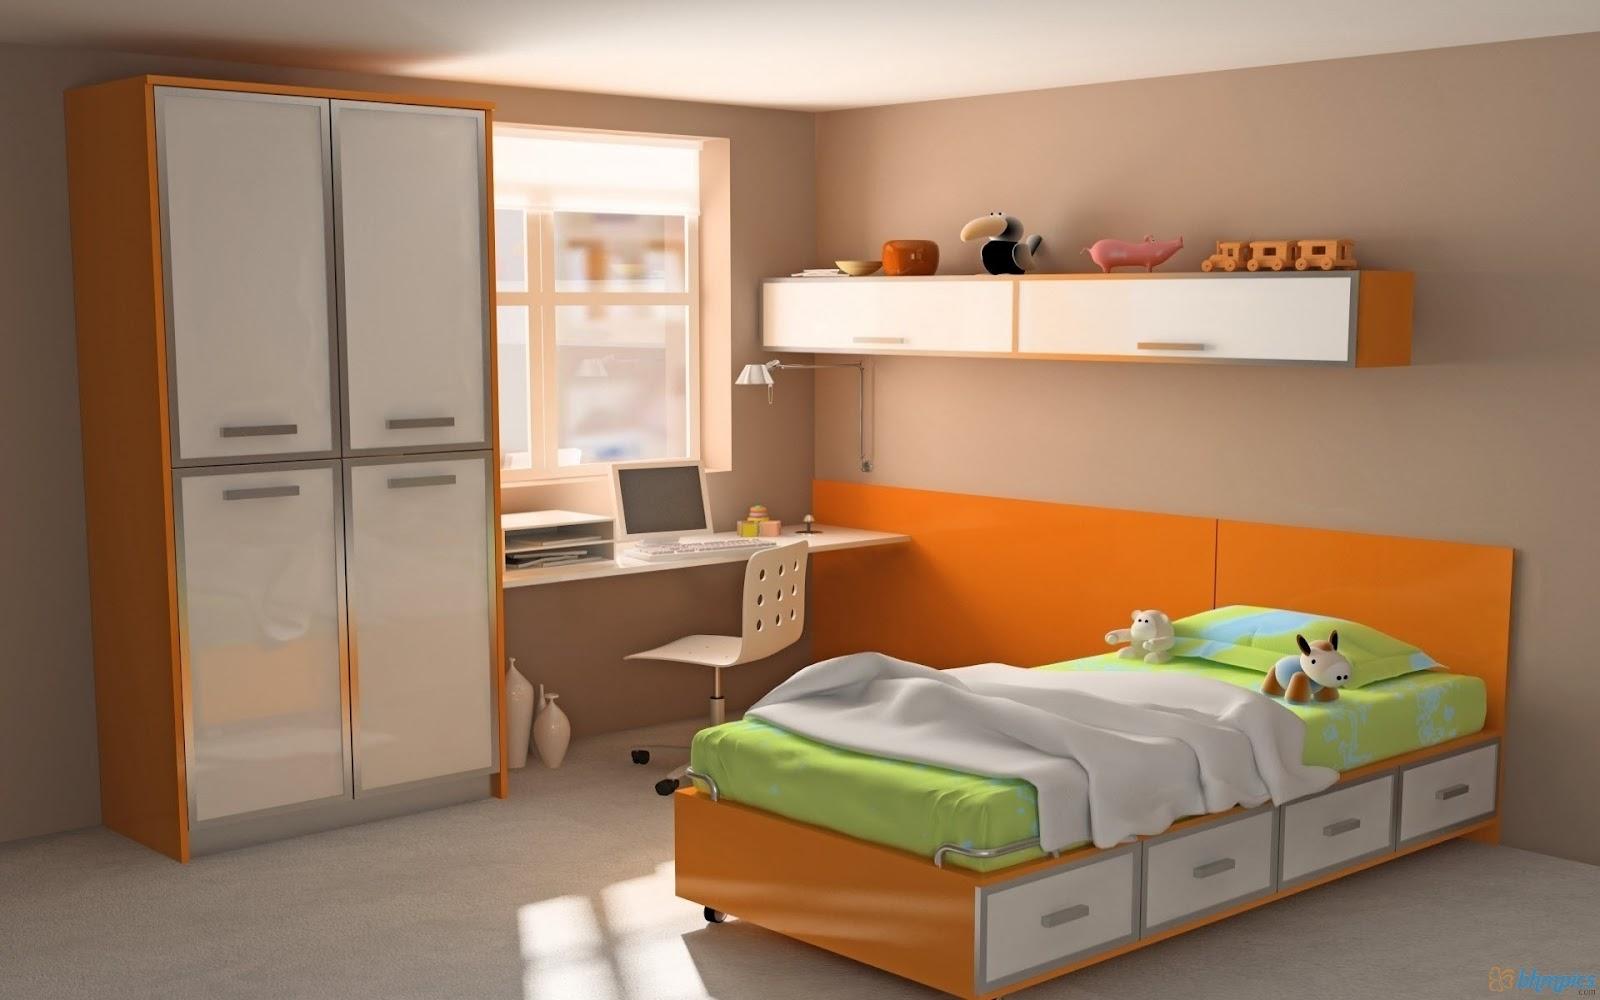 http://3.bp.blogspot.com/-xe4N8WzSxxA/T6_eDjGLYnI/AAAAAAAABzE/6zhFCNGSs8s/s1600/childrens_bedroom-1920x1200.jpg